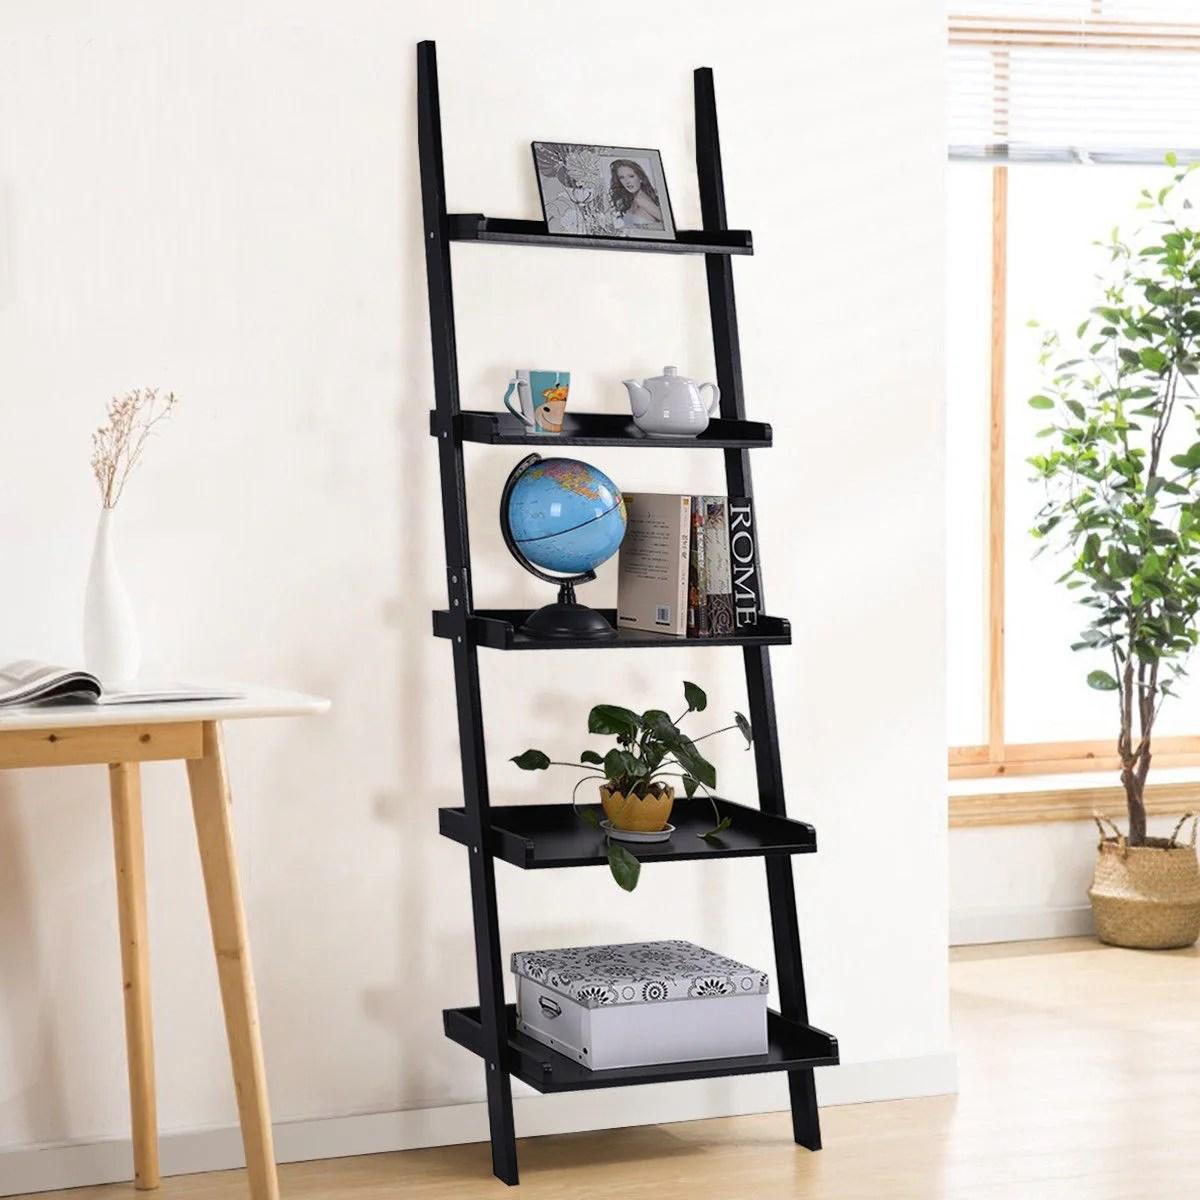 Costway Versatile Black 5 Tier Bookshelf Leaning Wall Shelf Ladder Bookcase Storage Display Furni